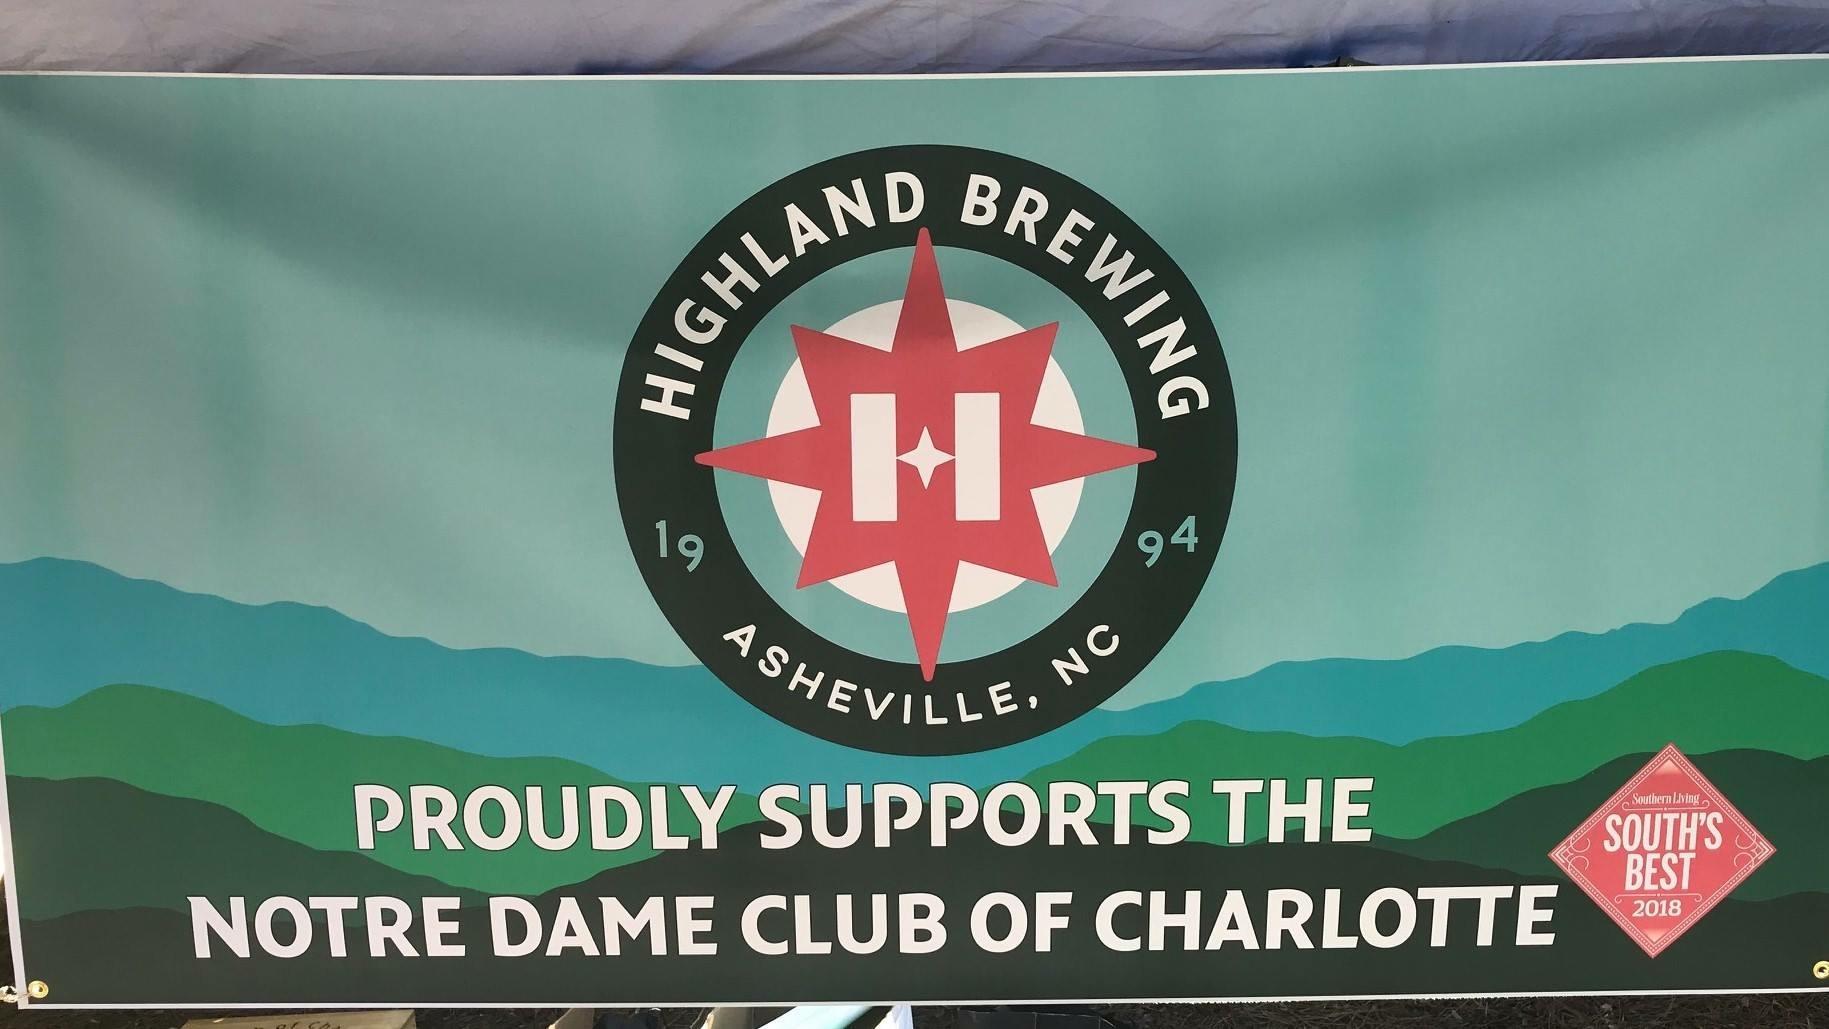 Notre Dame Club of Charlotte | Charlotte | Fighting Irish